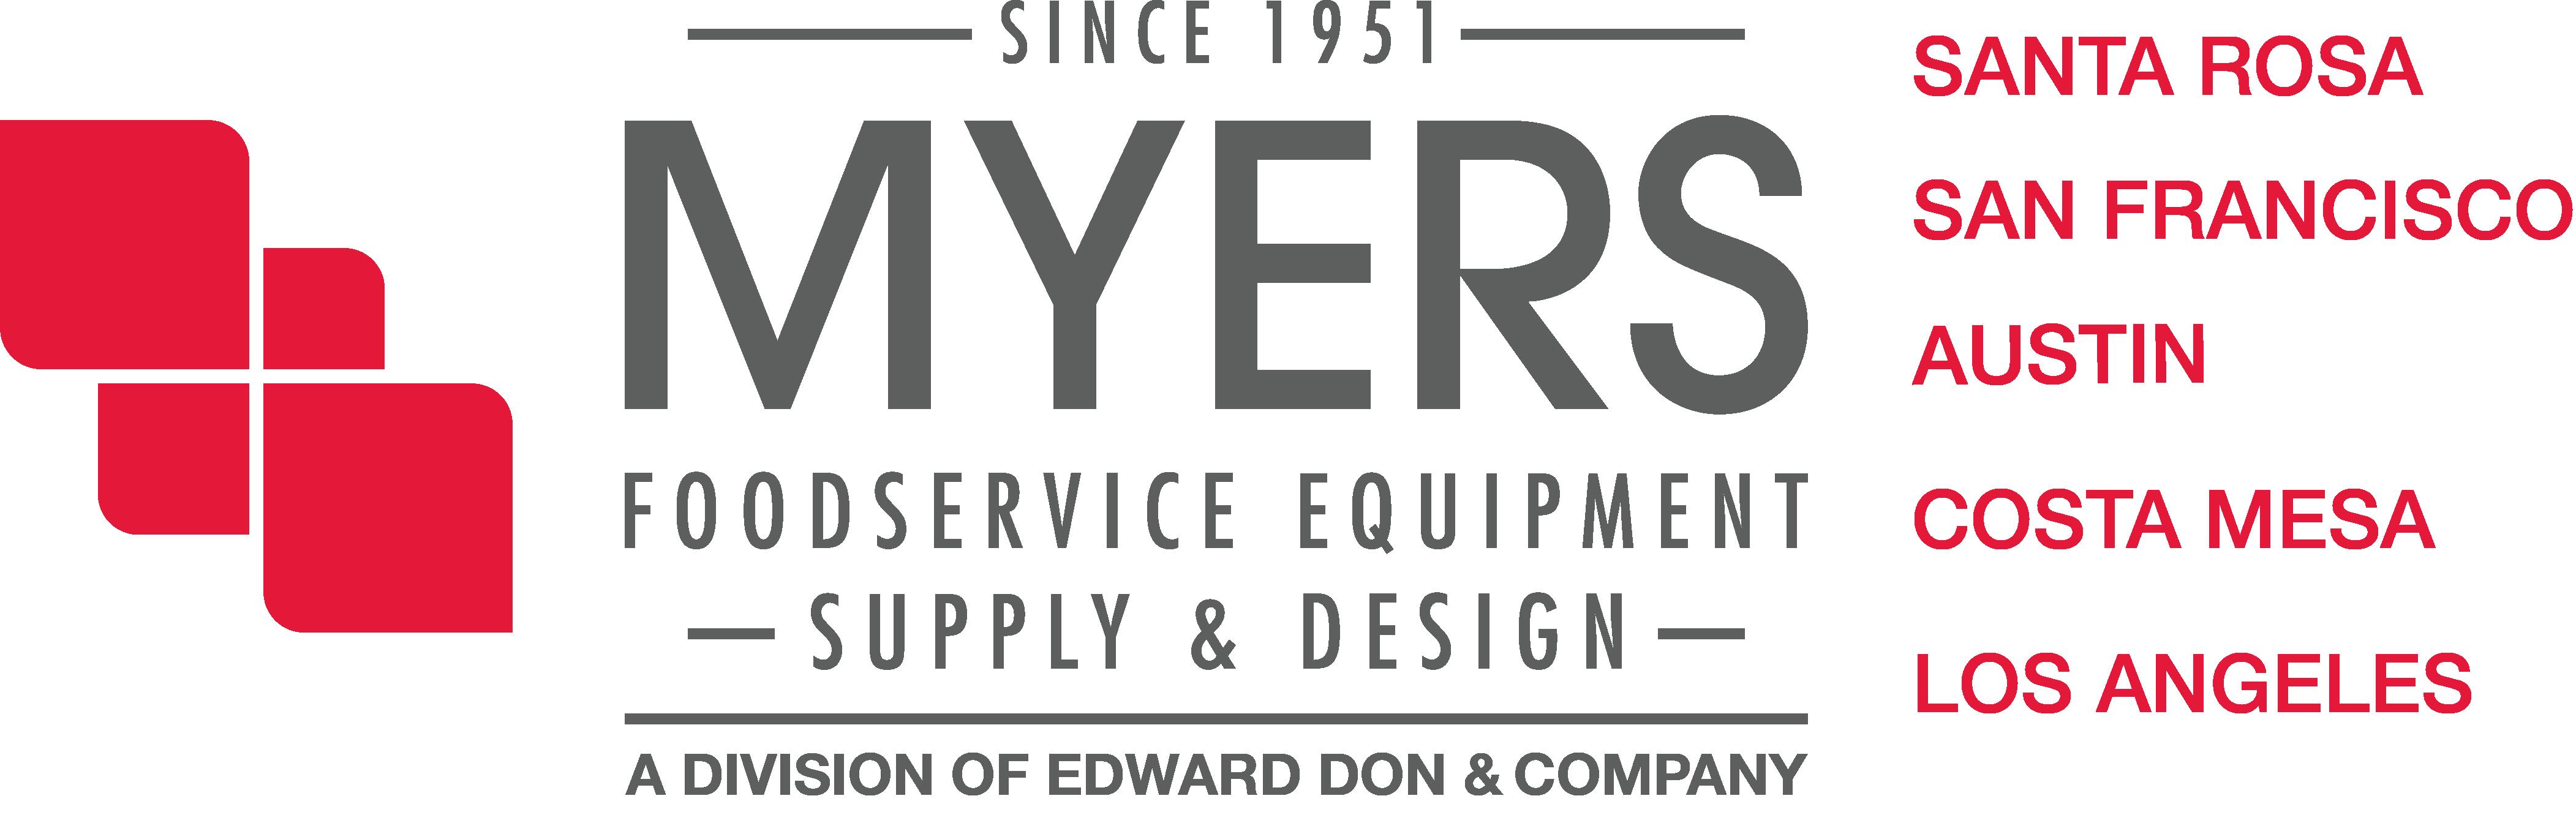 Myers Restaurant Supply | Santa Rosa | Food Service Equipment